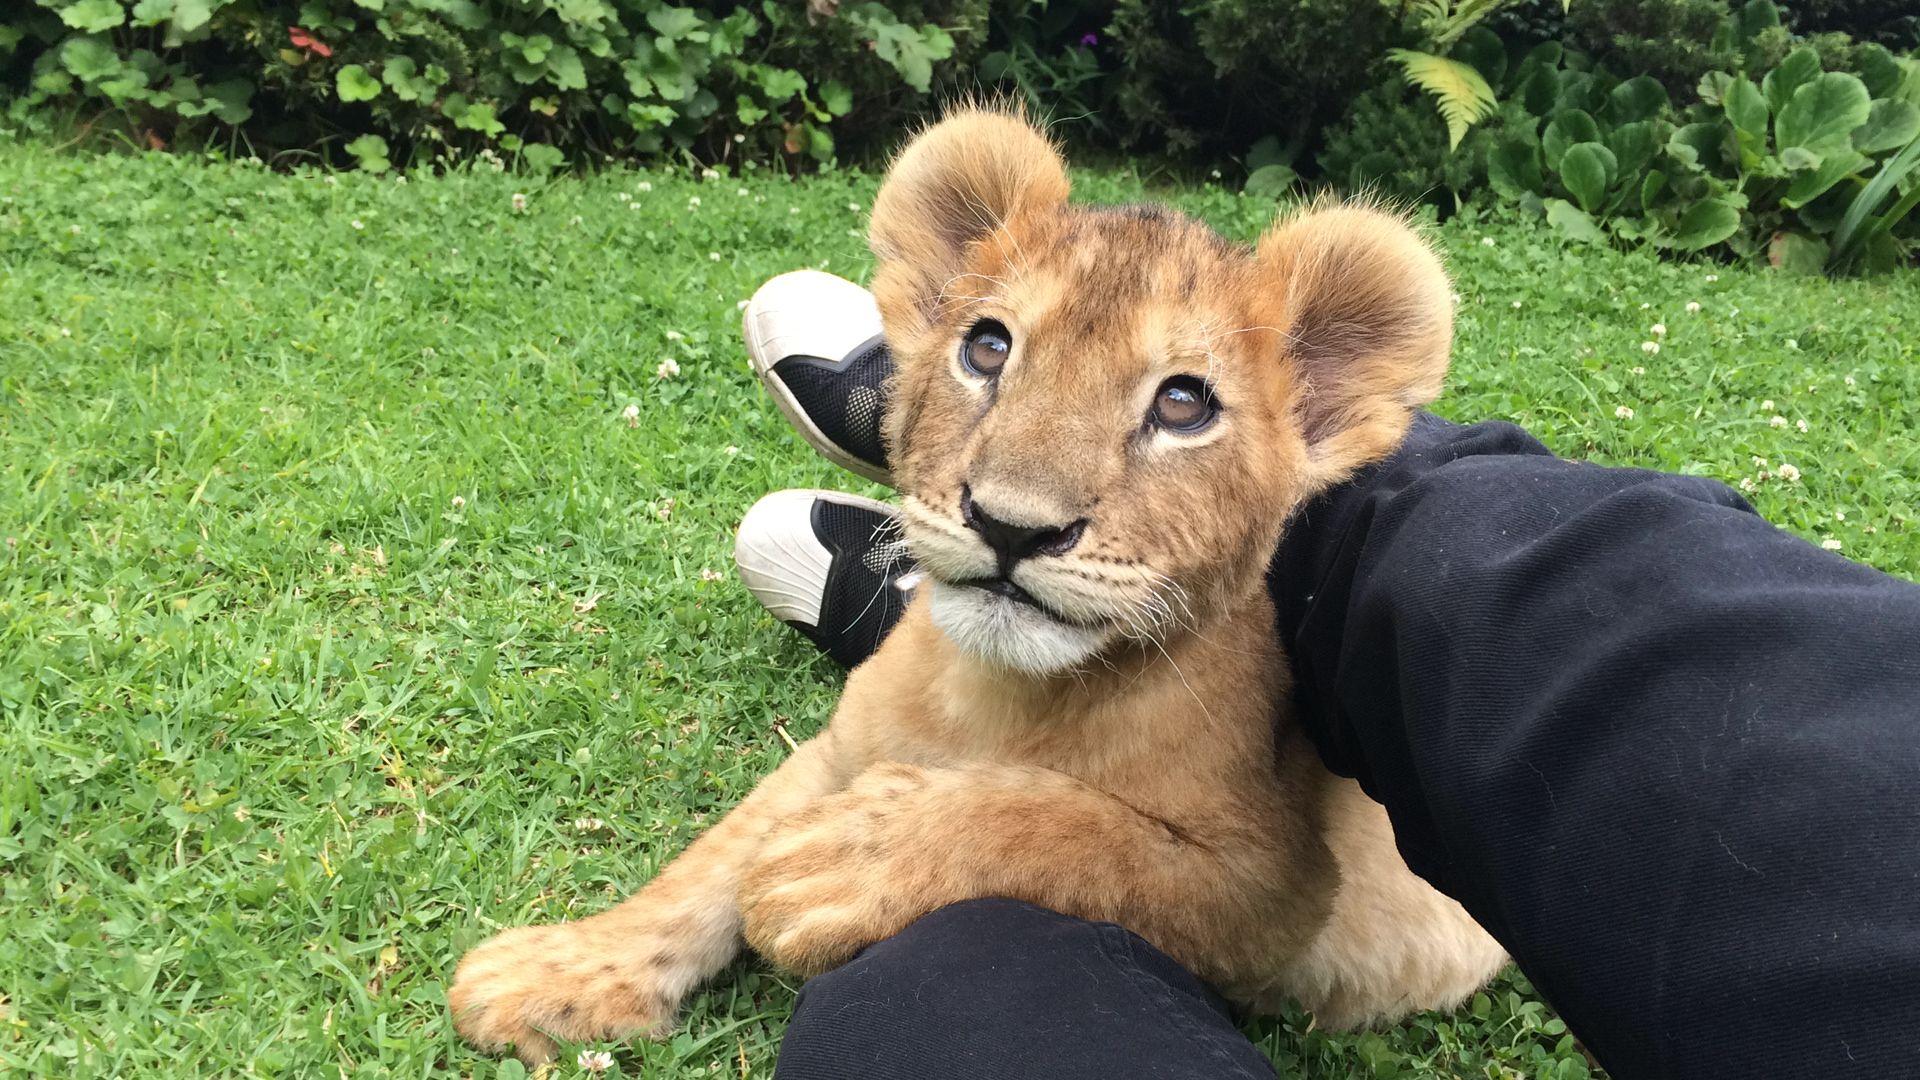 Back Jaguar White Tiger Foundation .. Follow and donate